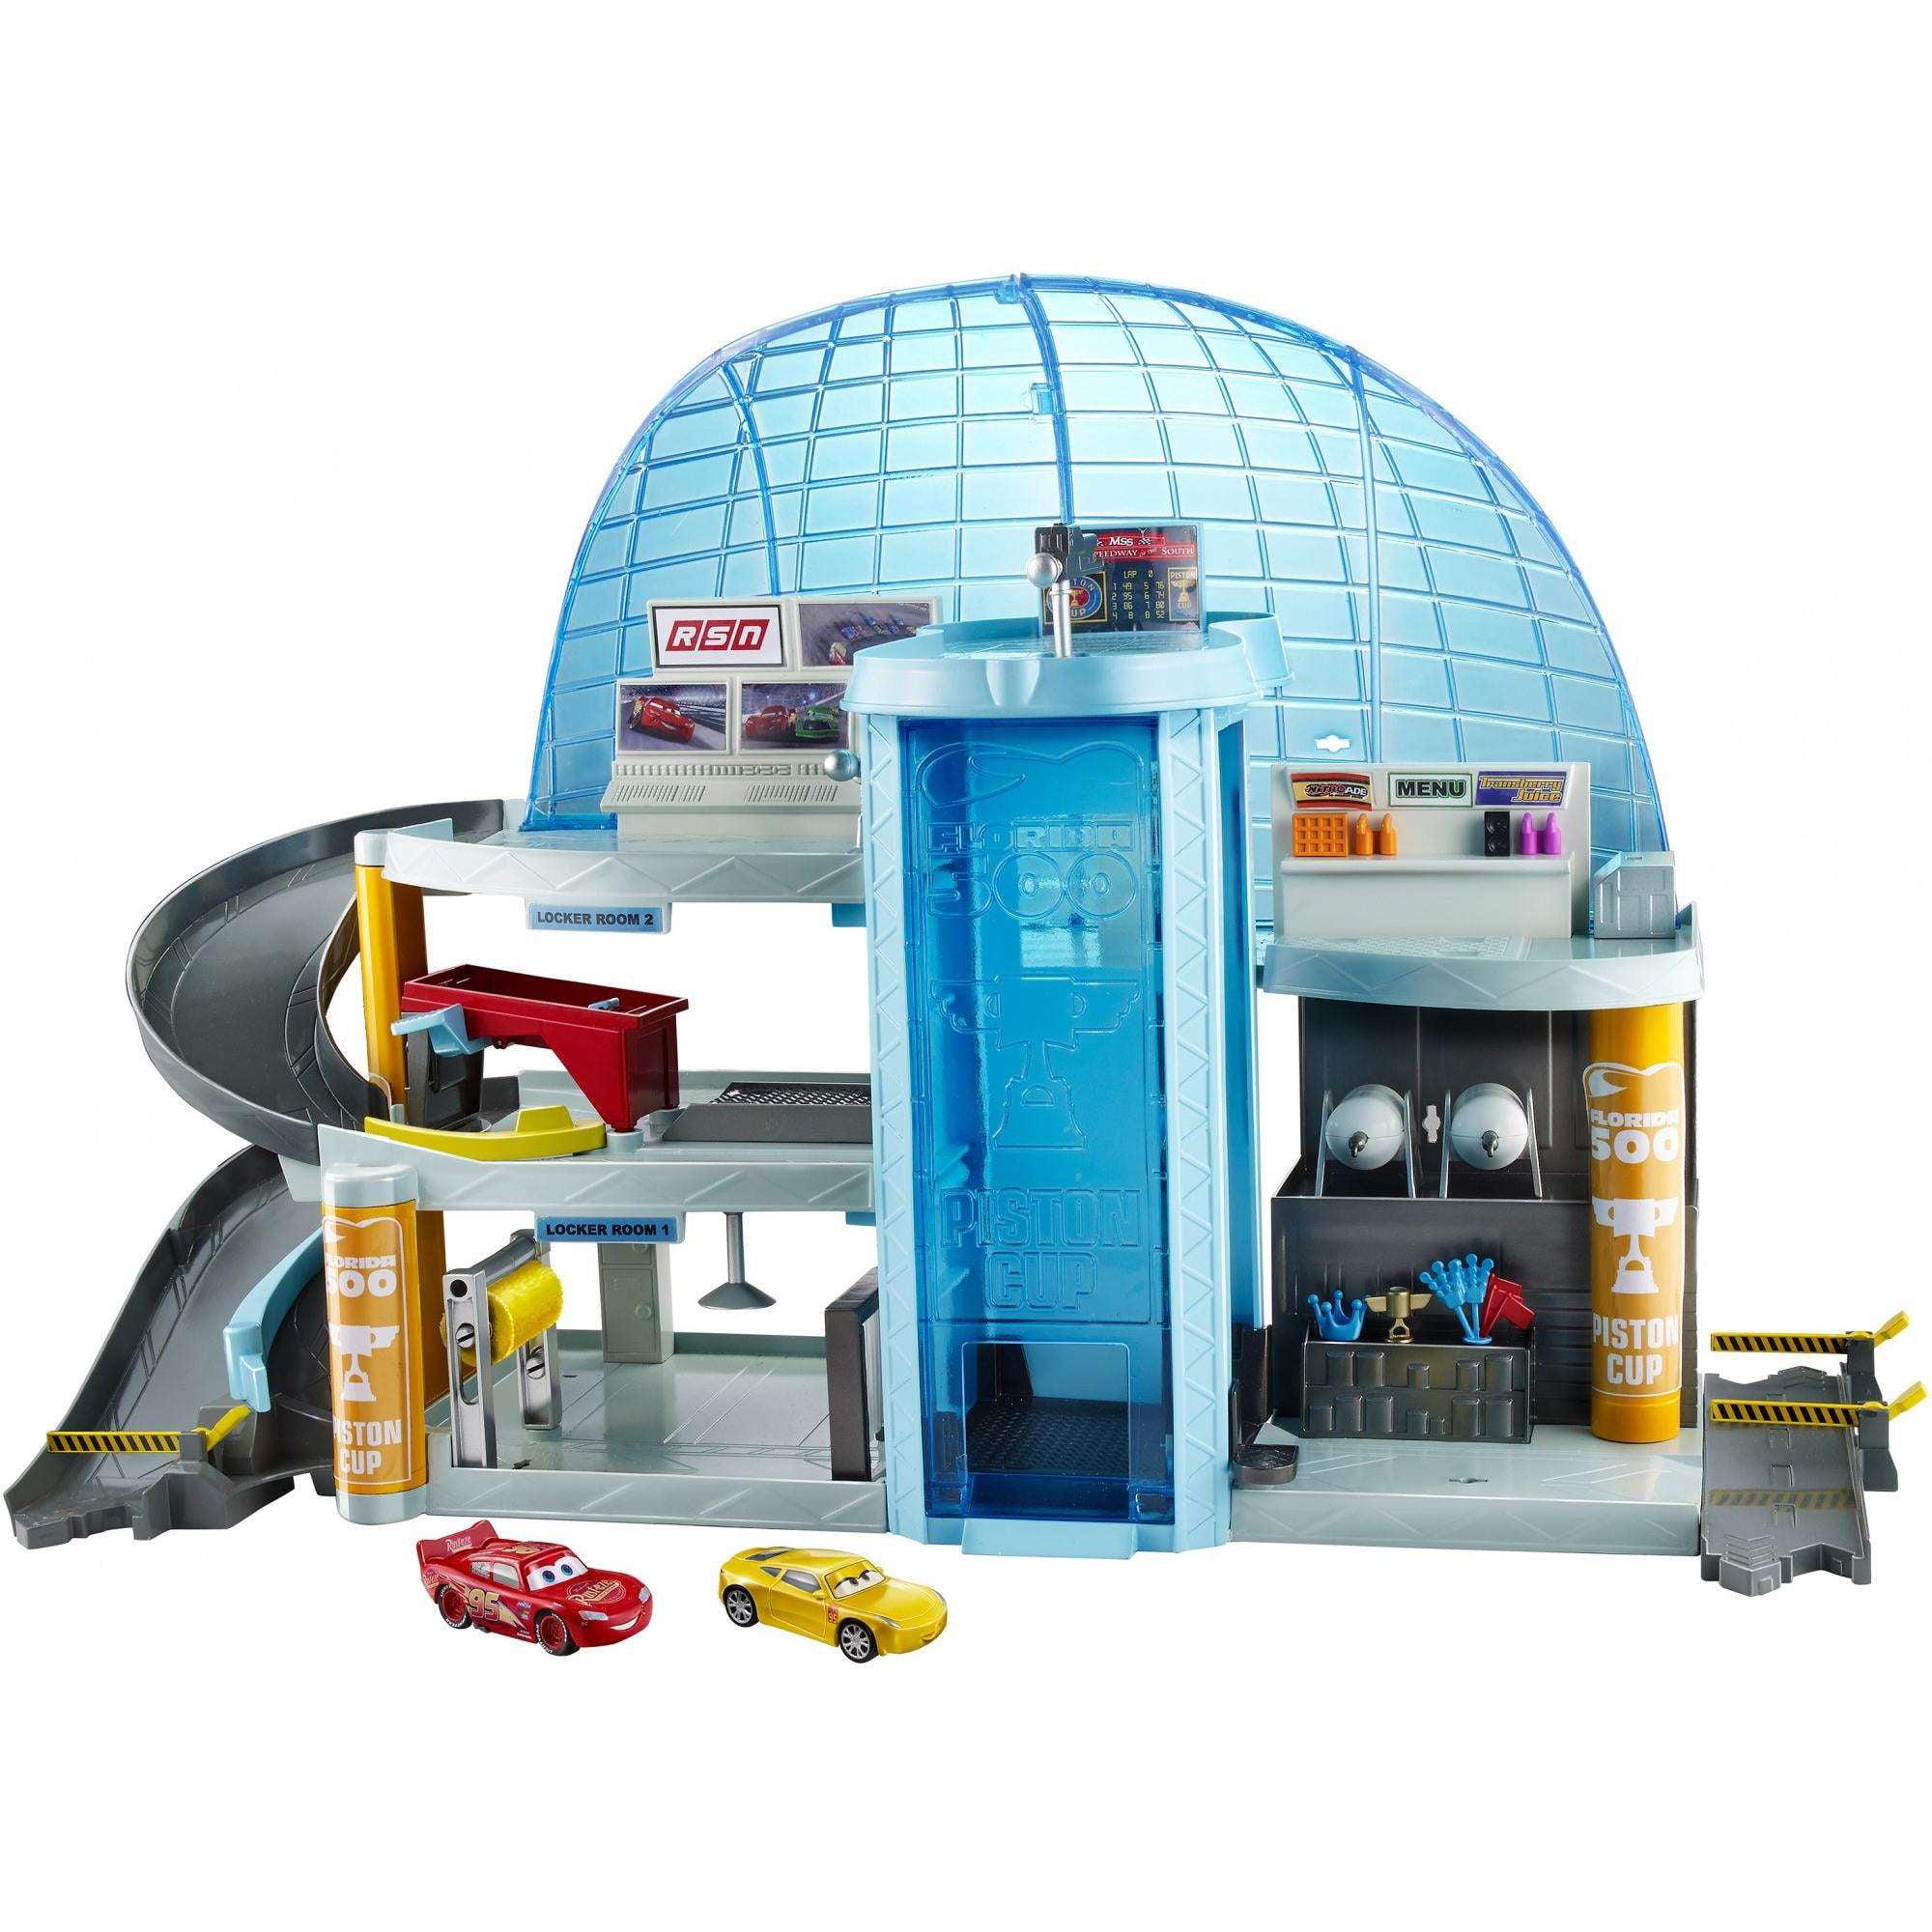 FLORIDA SPEEDWAY PIT STOP Disney Pixar CARS 3 Toy Playset